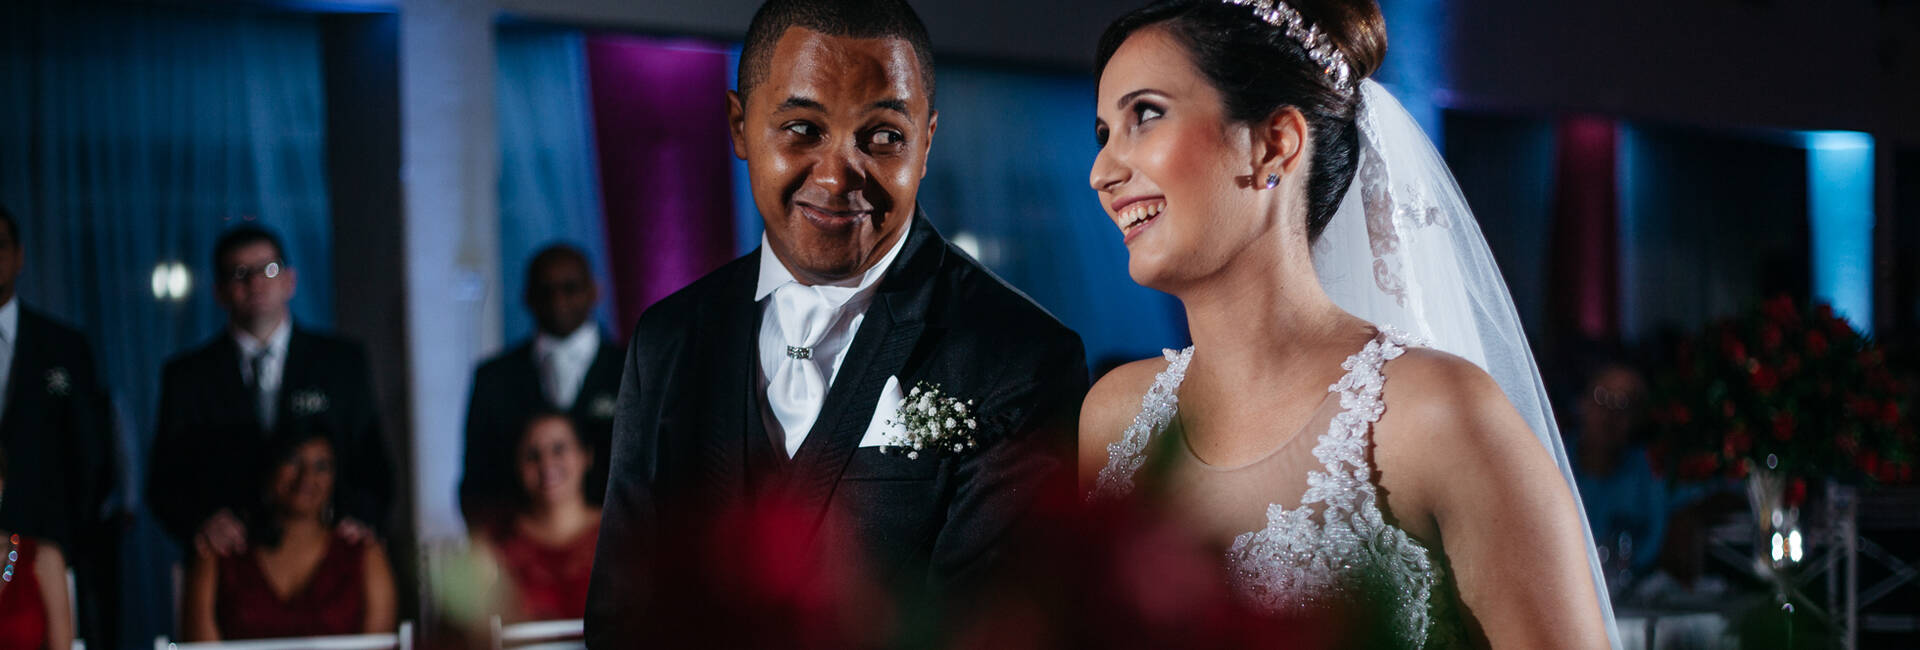 Casamento de Lari & Quill